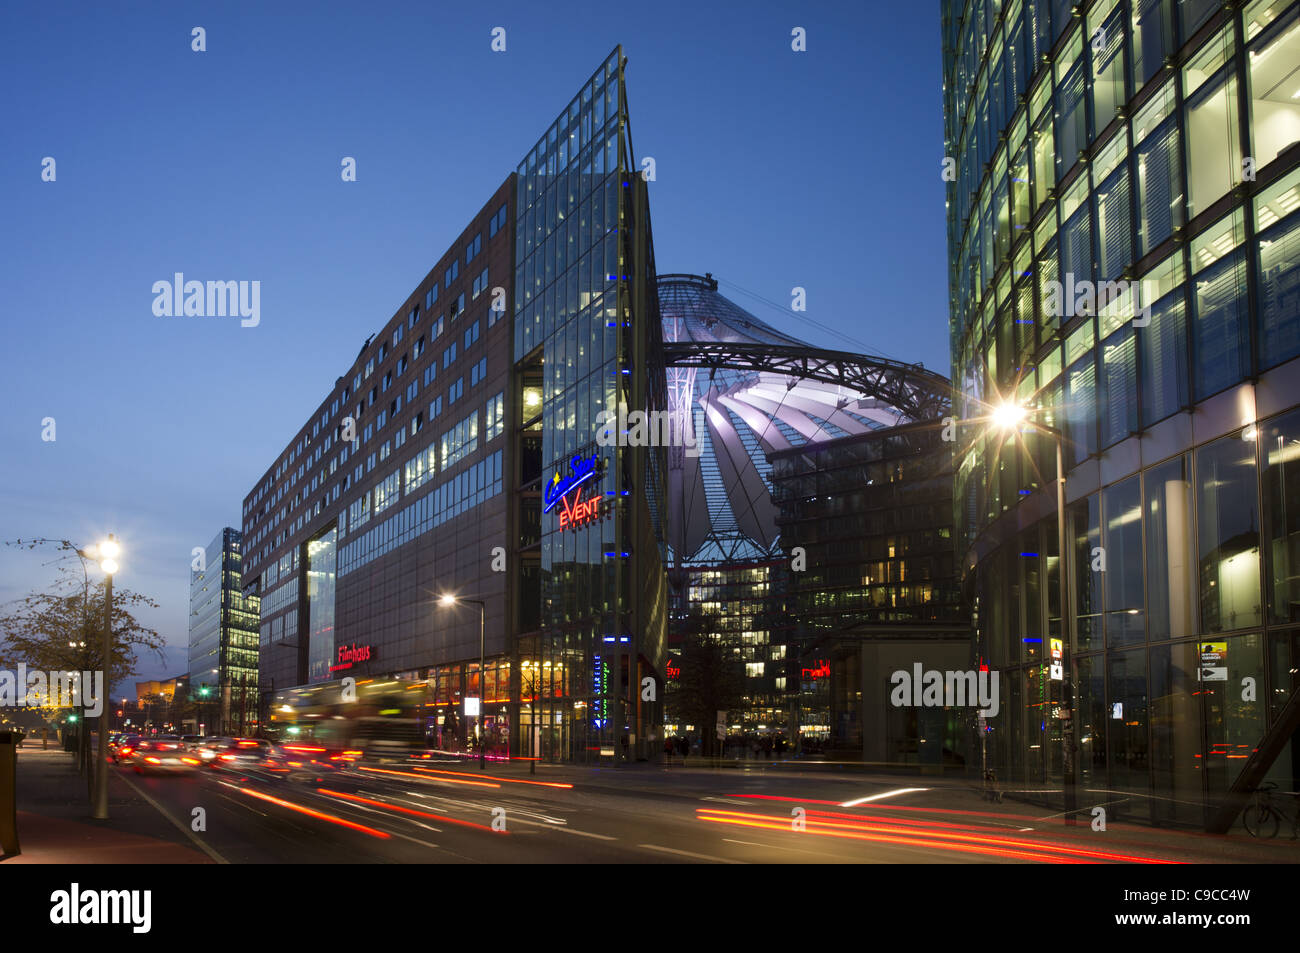 Spielcasino Potsdamer Platz